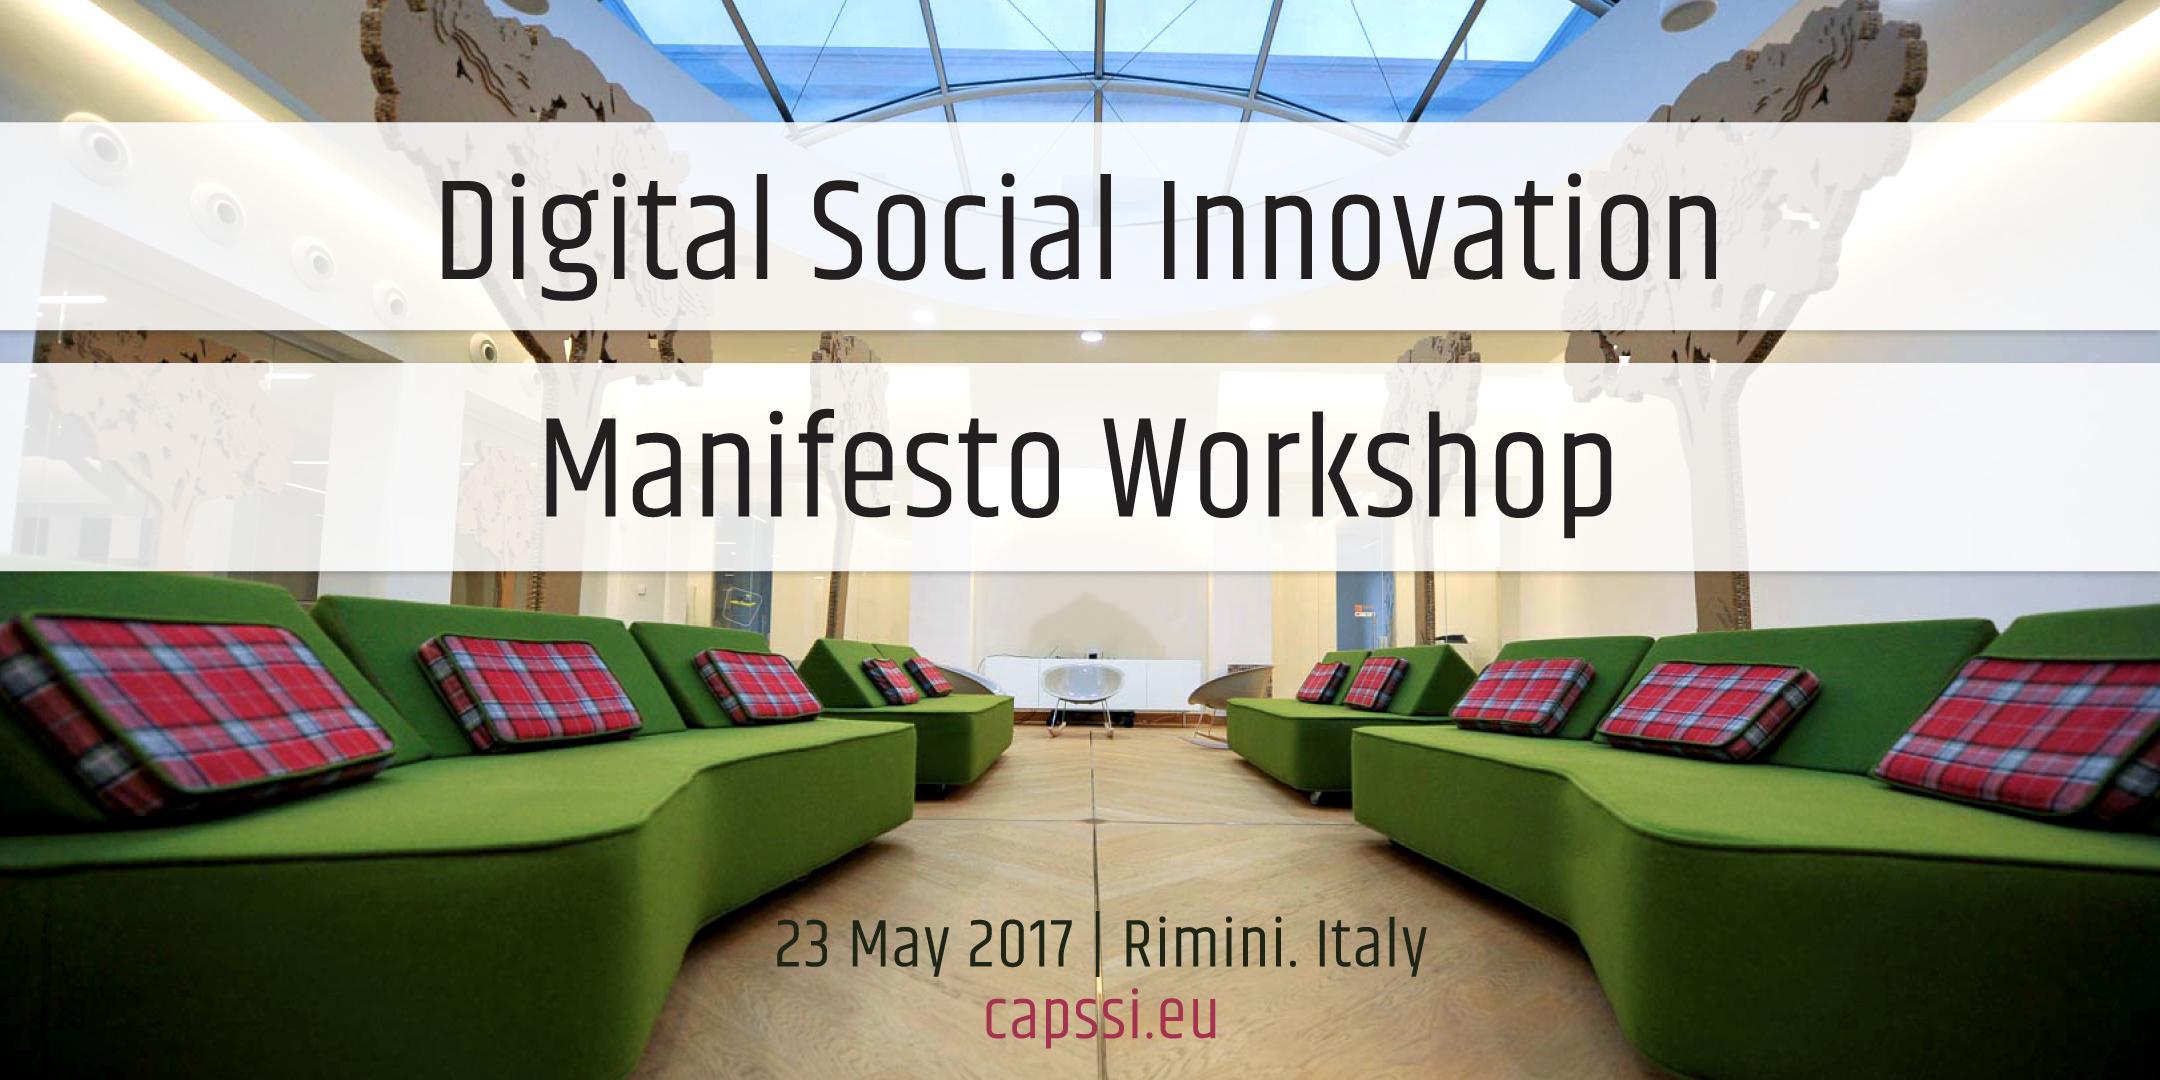 Digital Social Innovation Manifesto Workshop